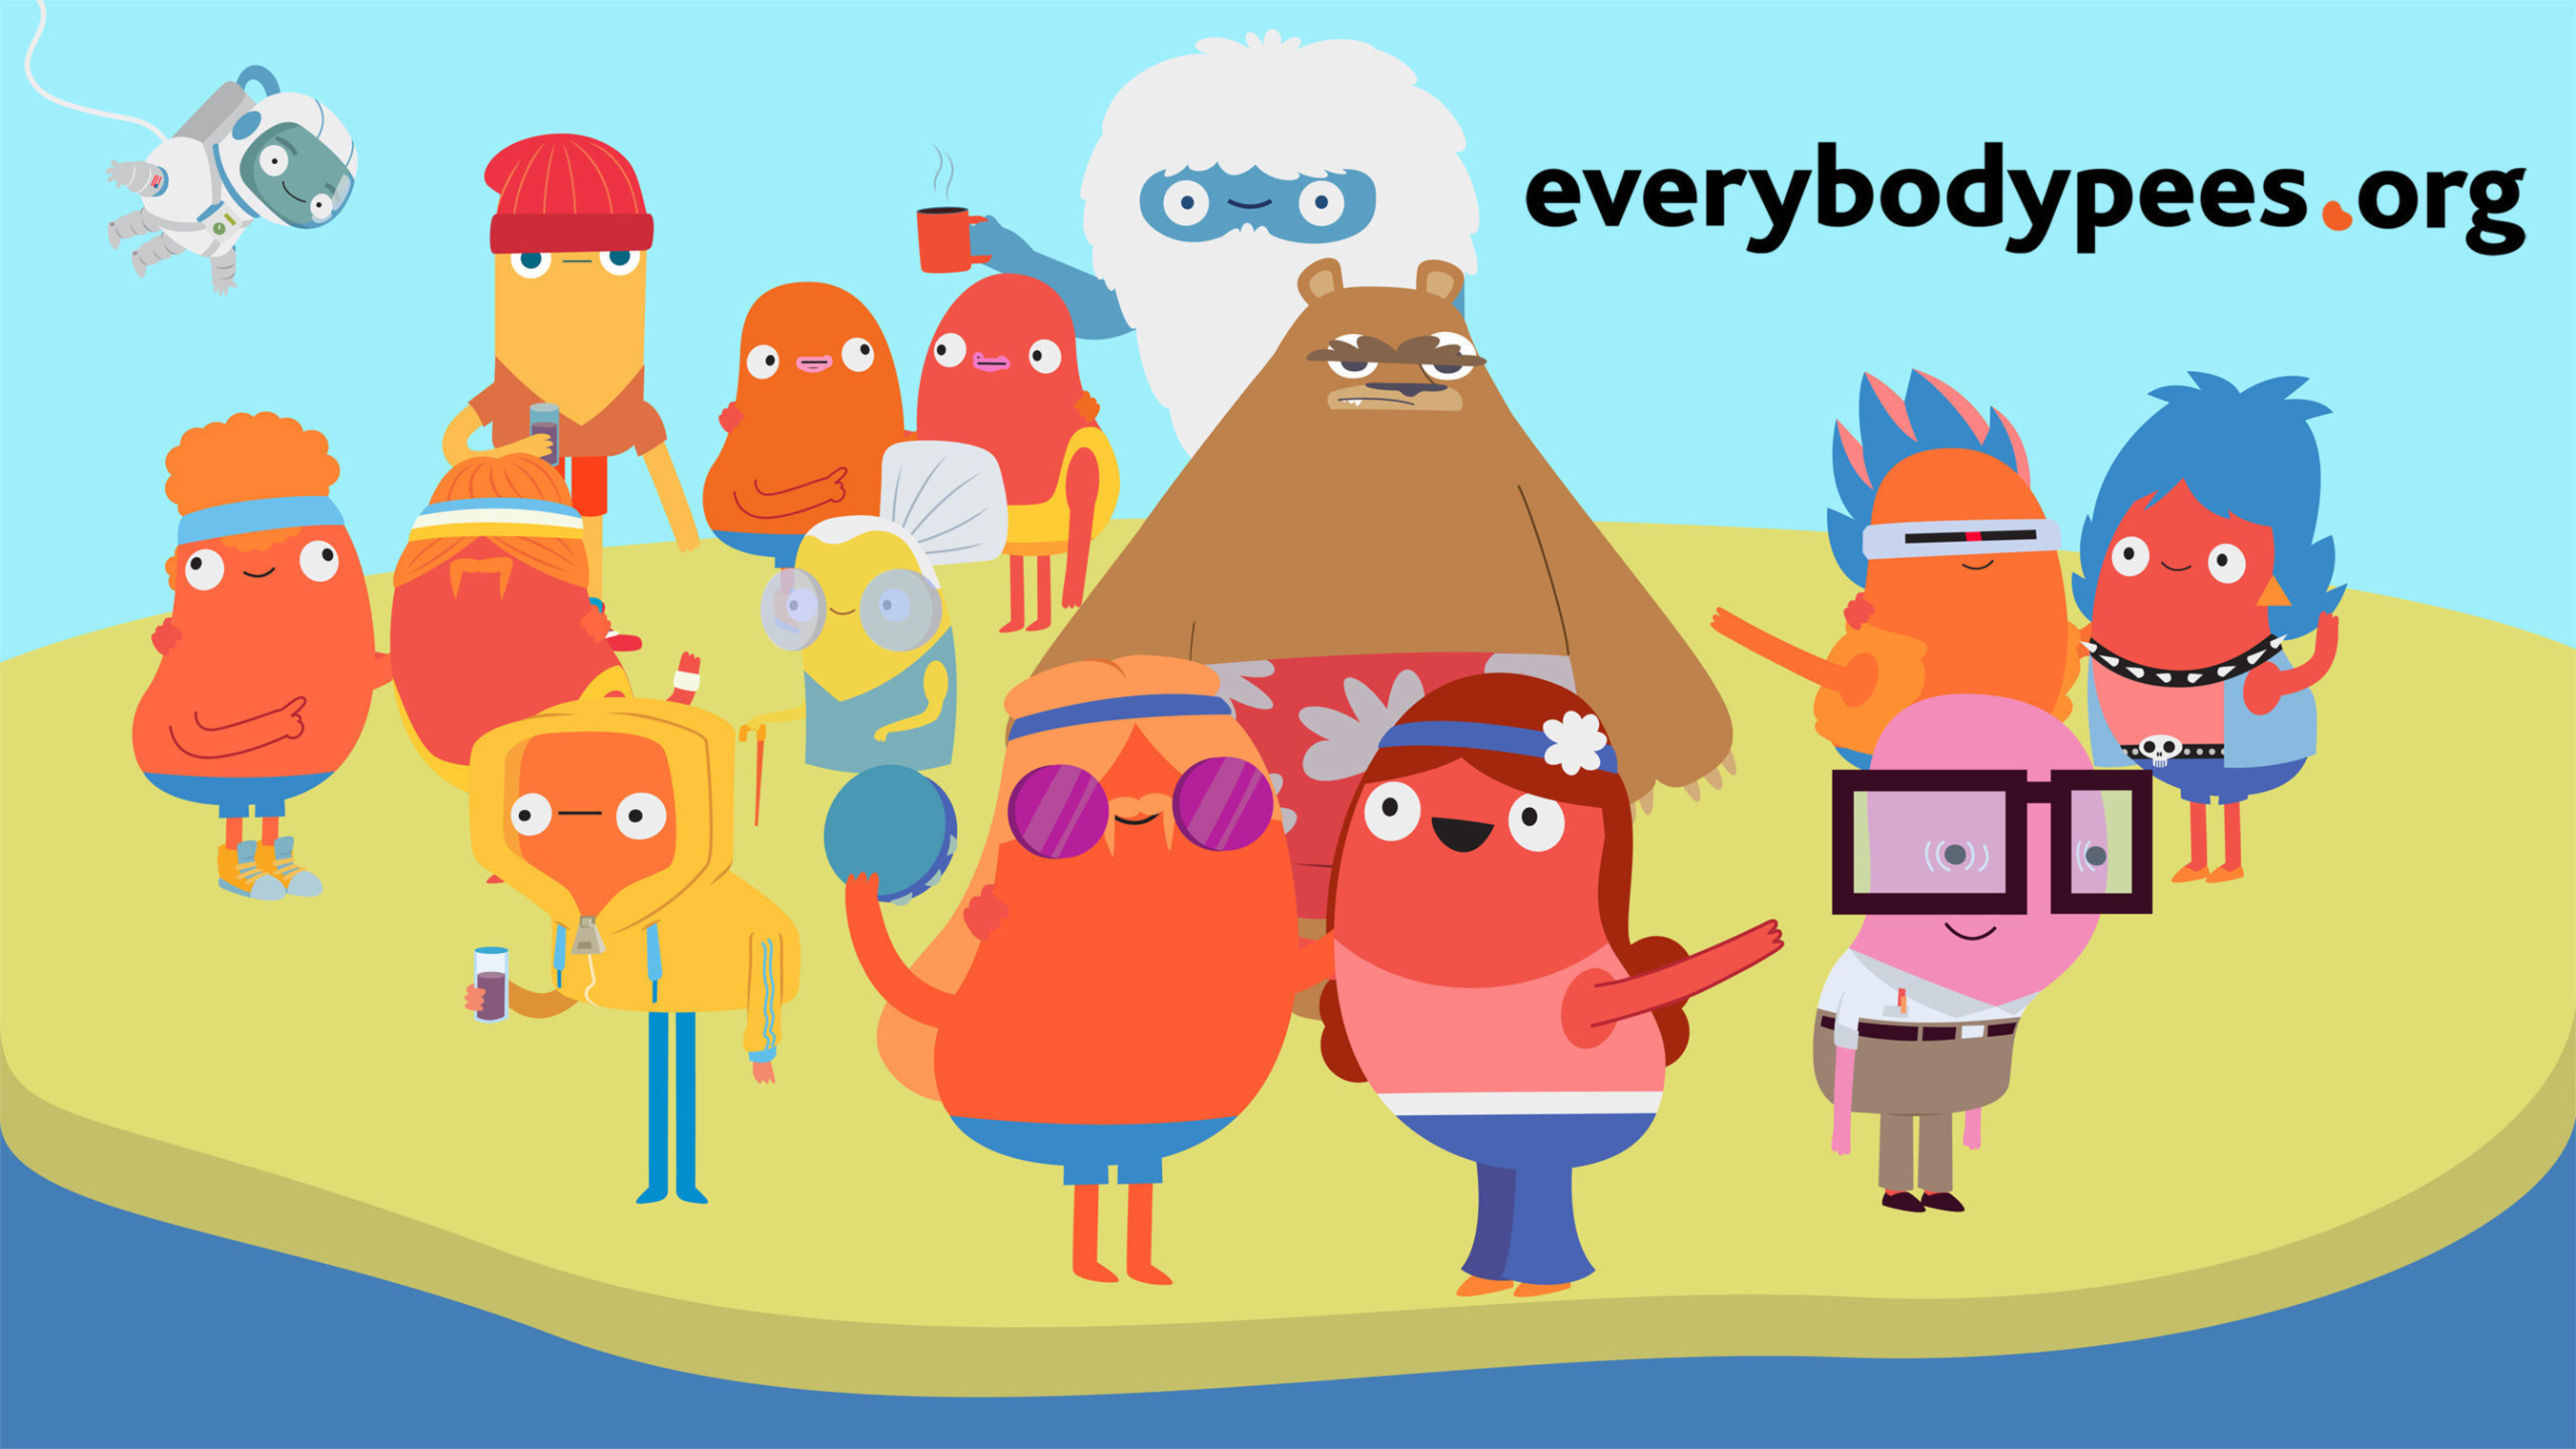 www.everybodypees.org